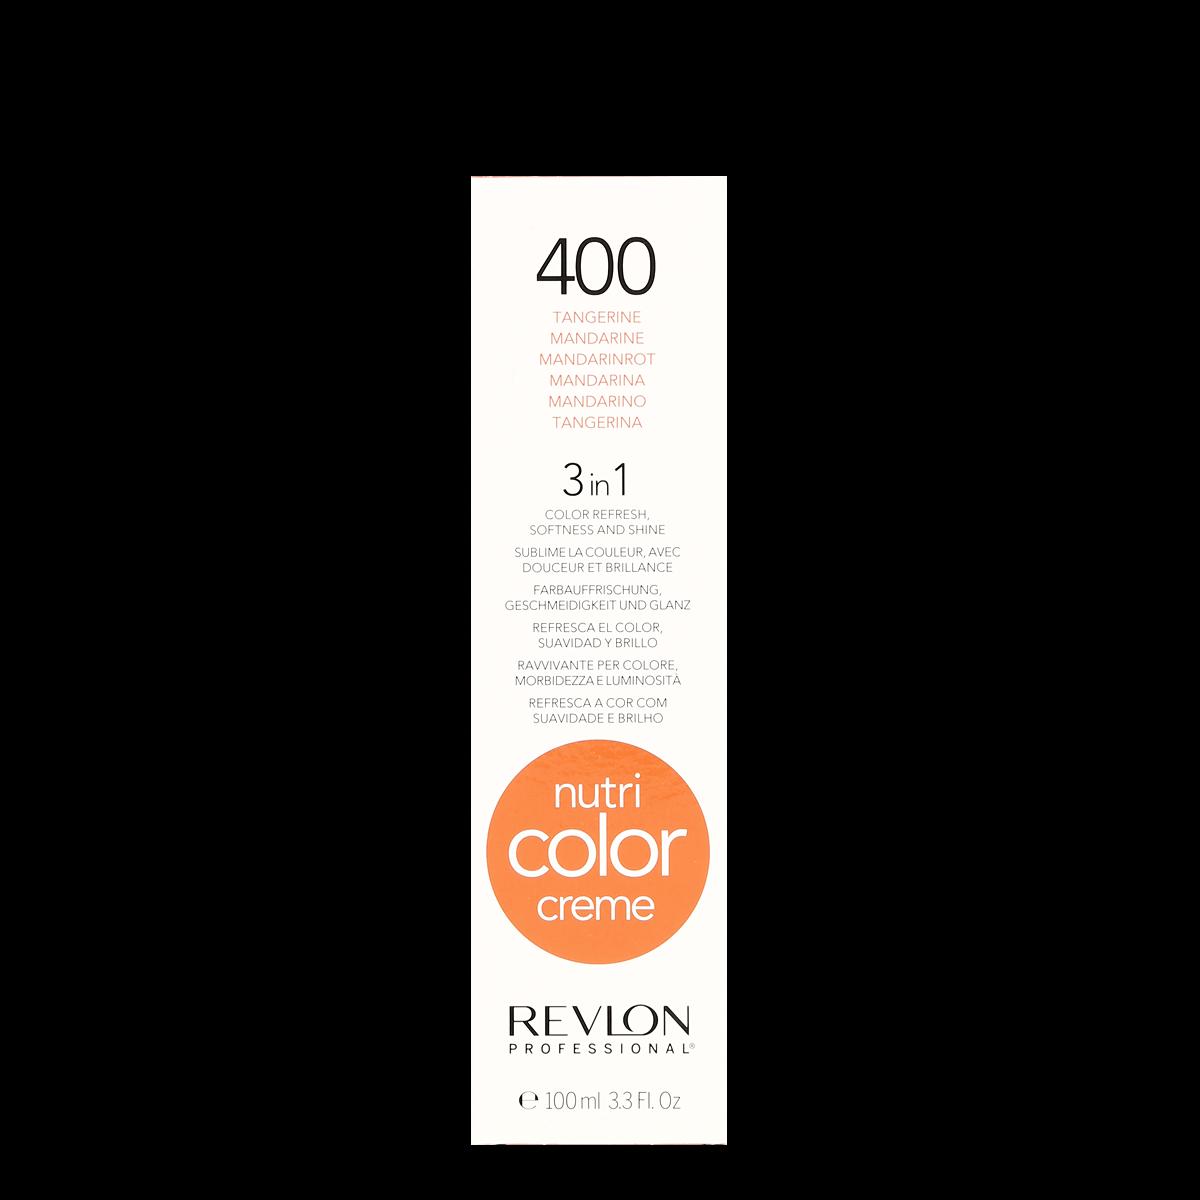 Revlon Professional Nutri Color Creme 400 Tangerine 100ml.